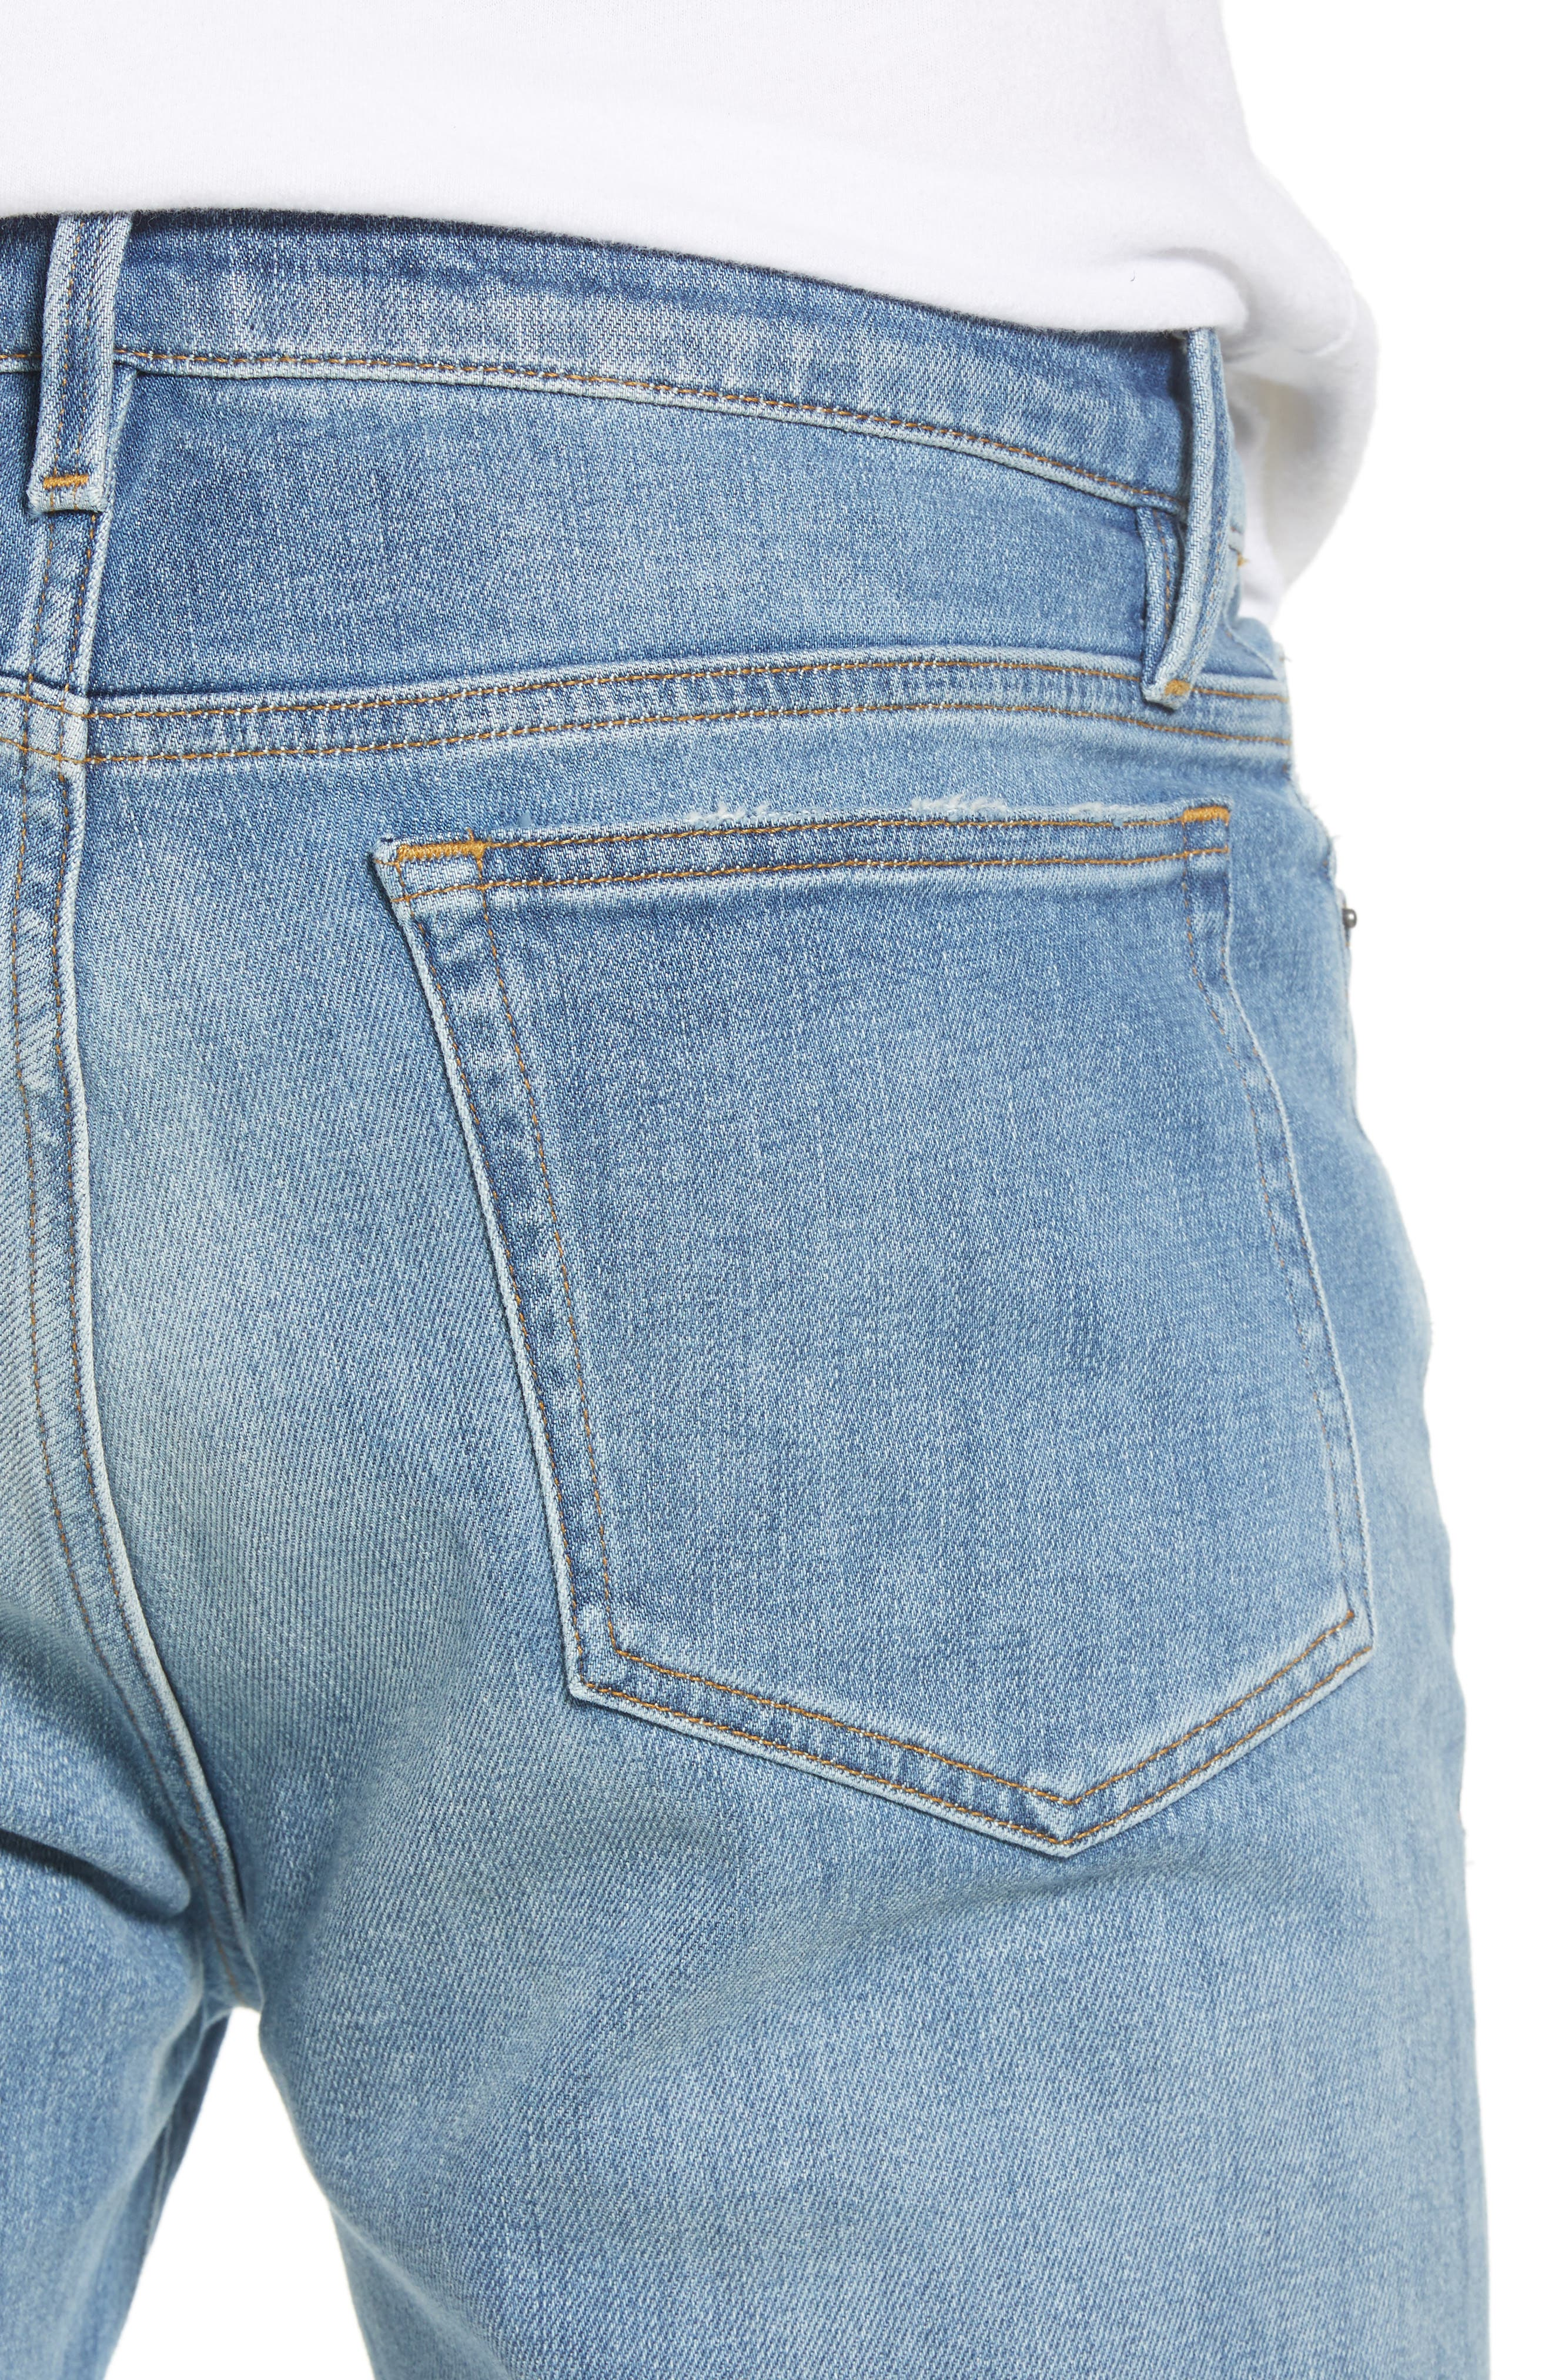 L'Homme Skinny Jeans,                             Alternate thumbnail 4, color,                             PICKNEY